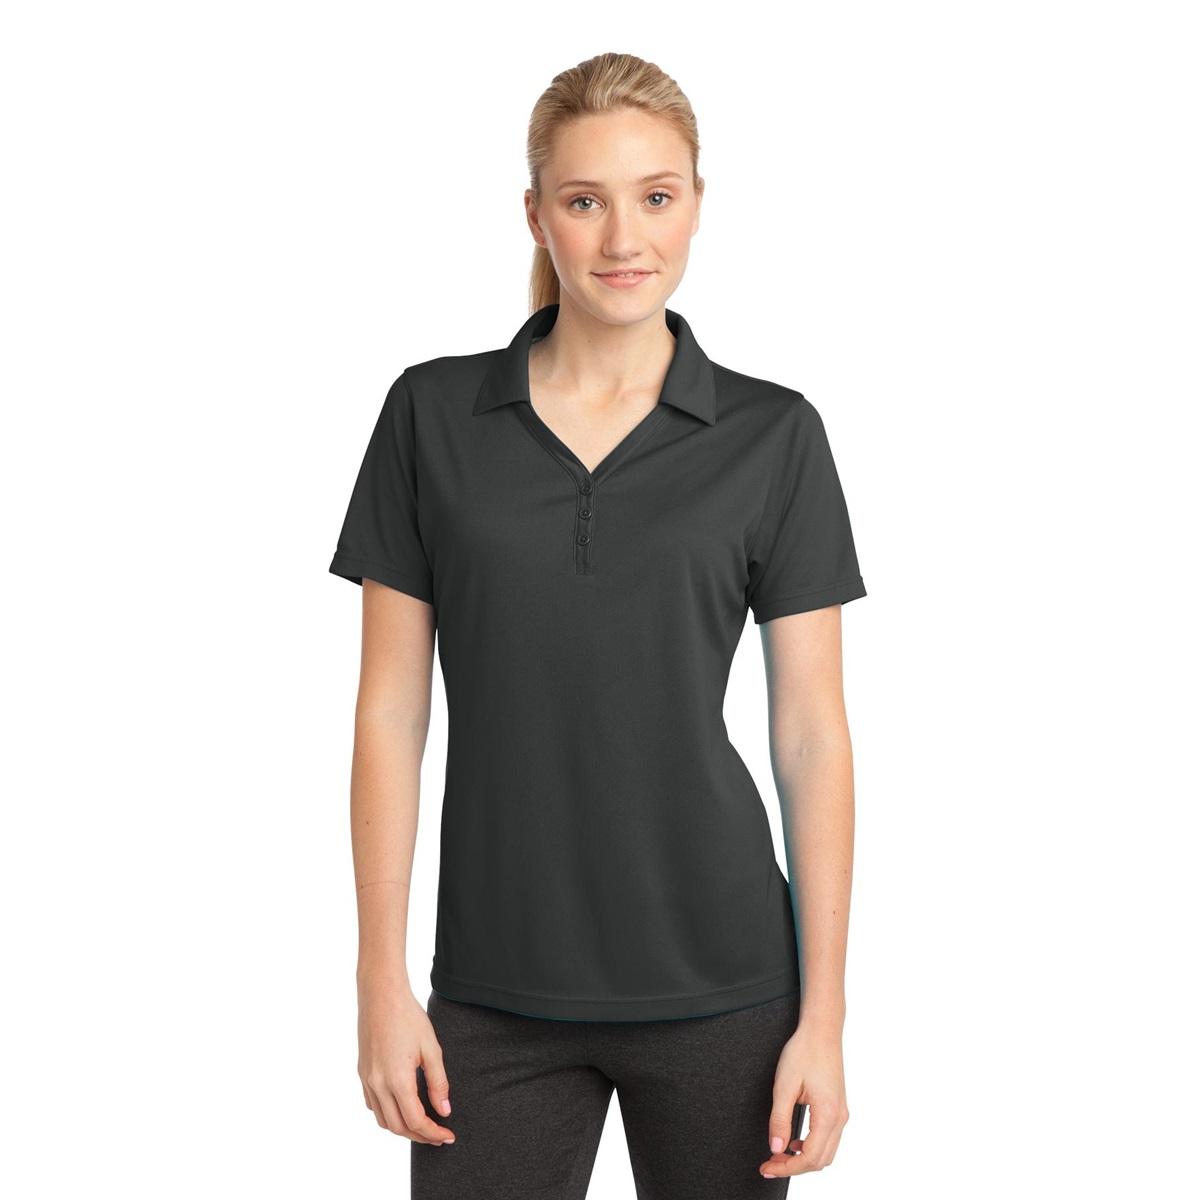 Sport Tek Lst680 Ladies Posicharge Micro Mesh Polo Shirt